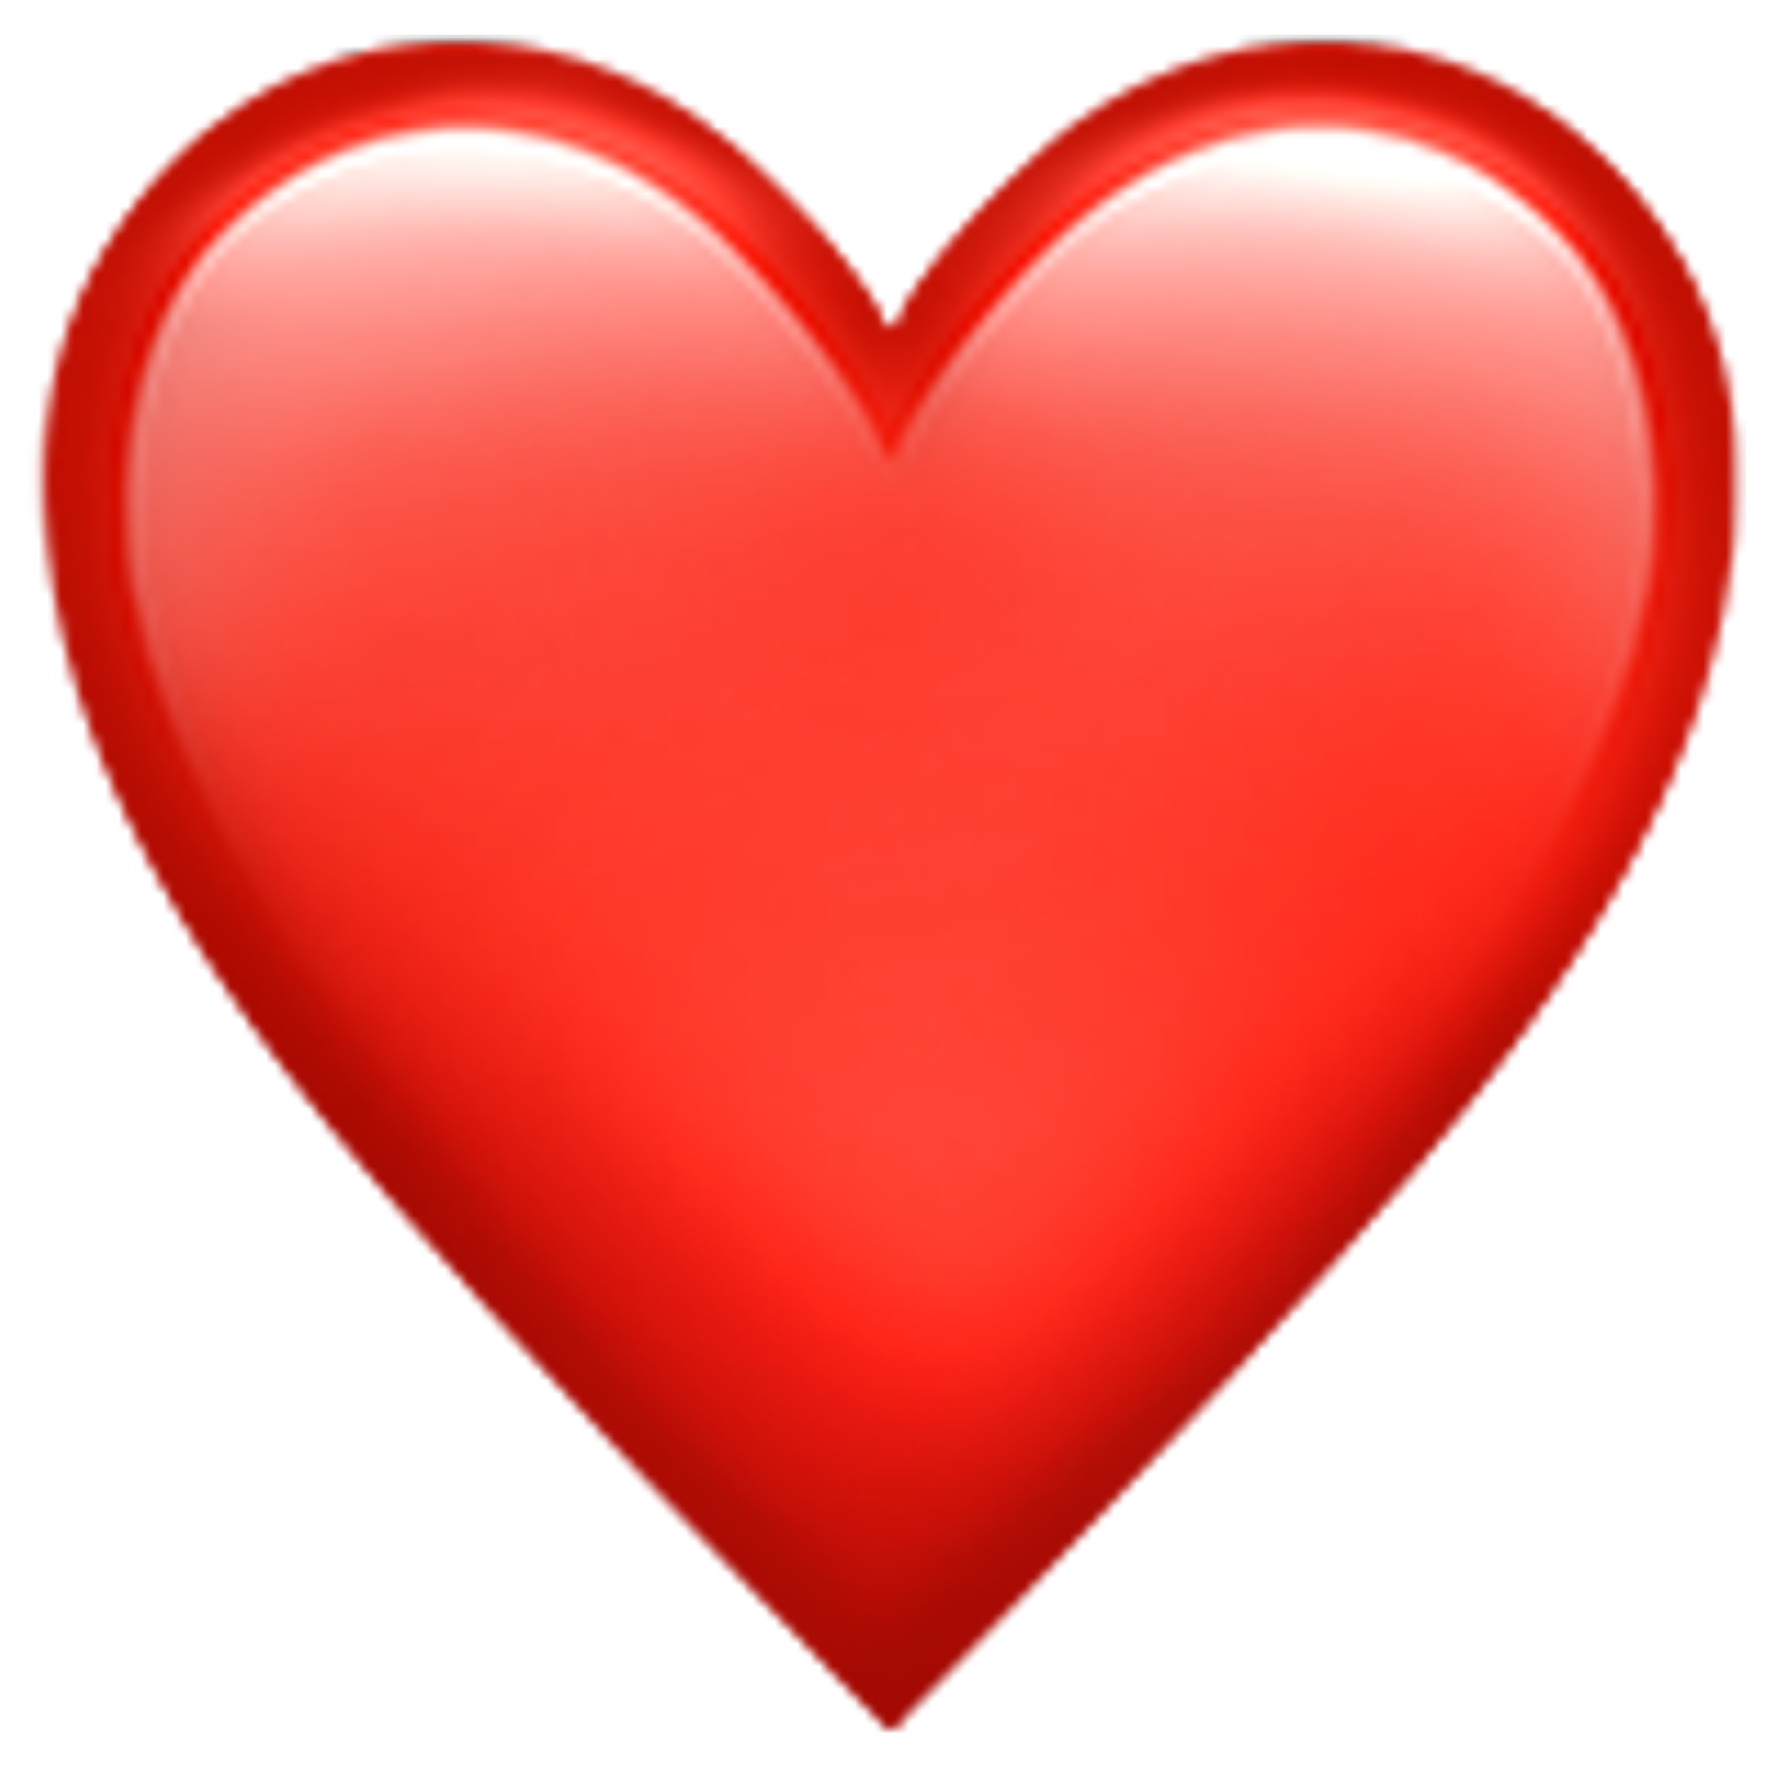 heart red whatsapp imessage emoji